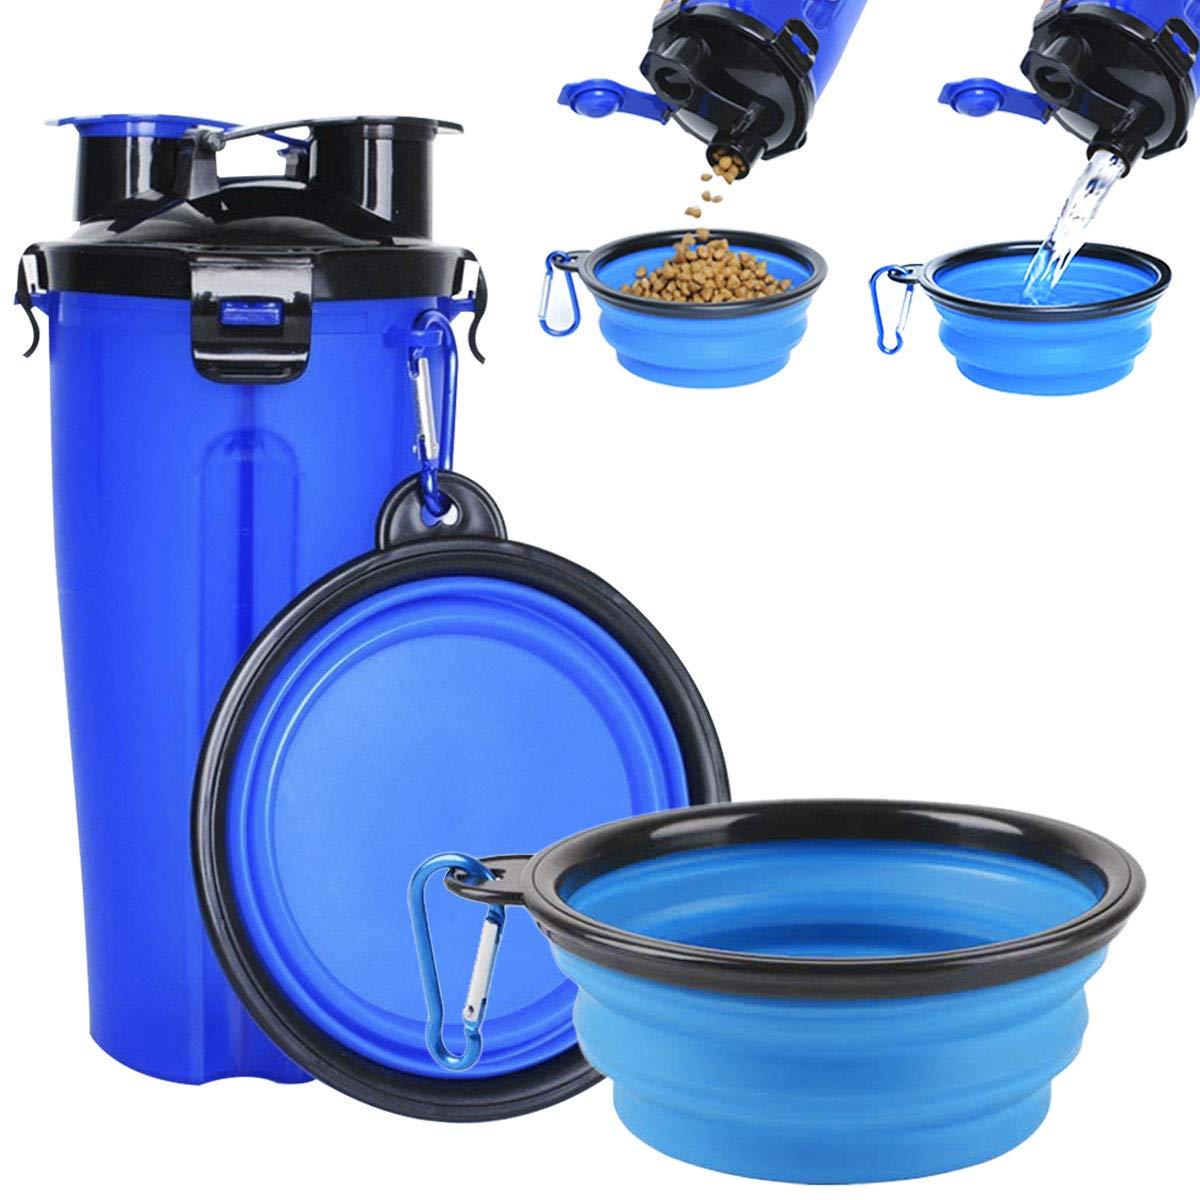 Portable Dog Water Bowl >> Pet Supplies Almall Portable Dog Water Bottle With Collapsible Dog